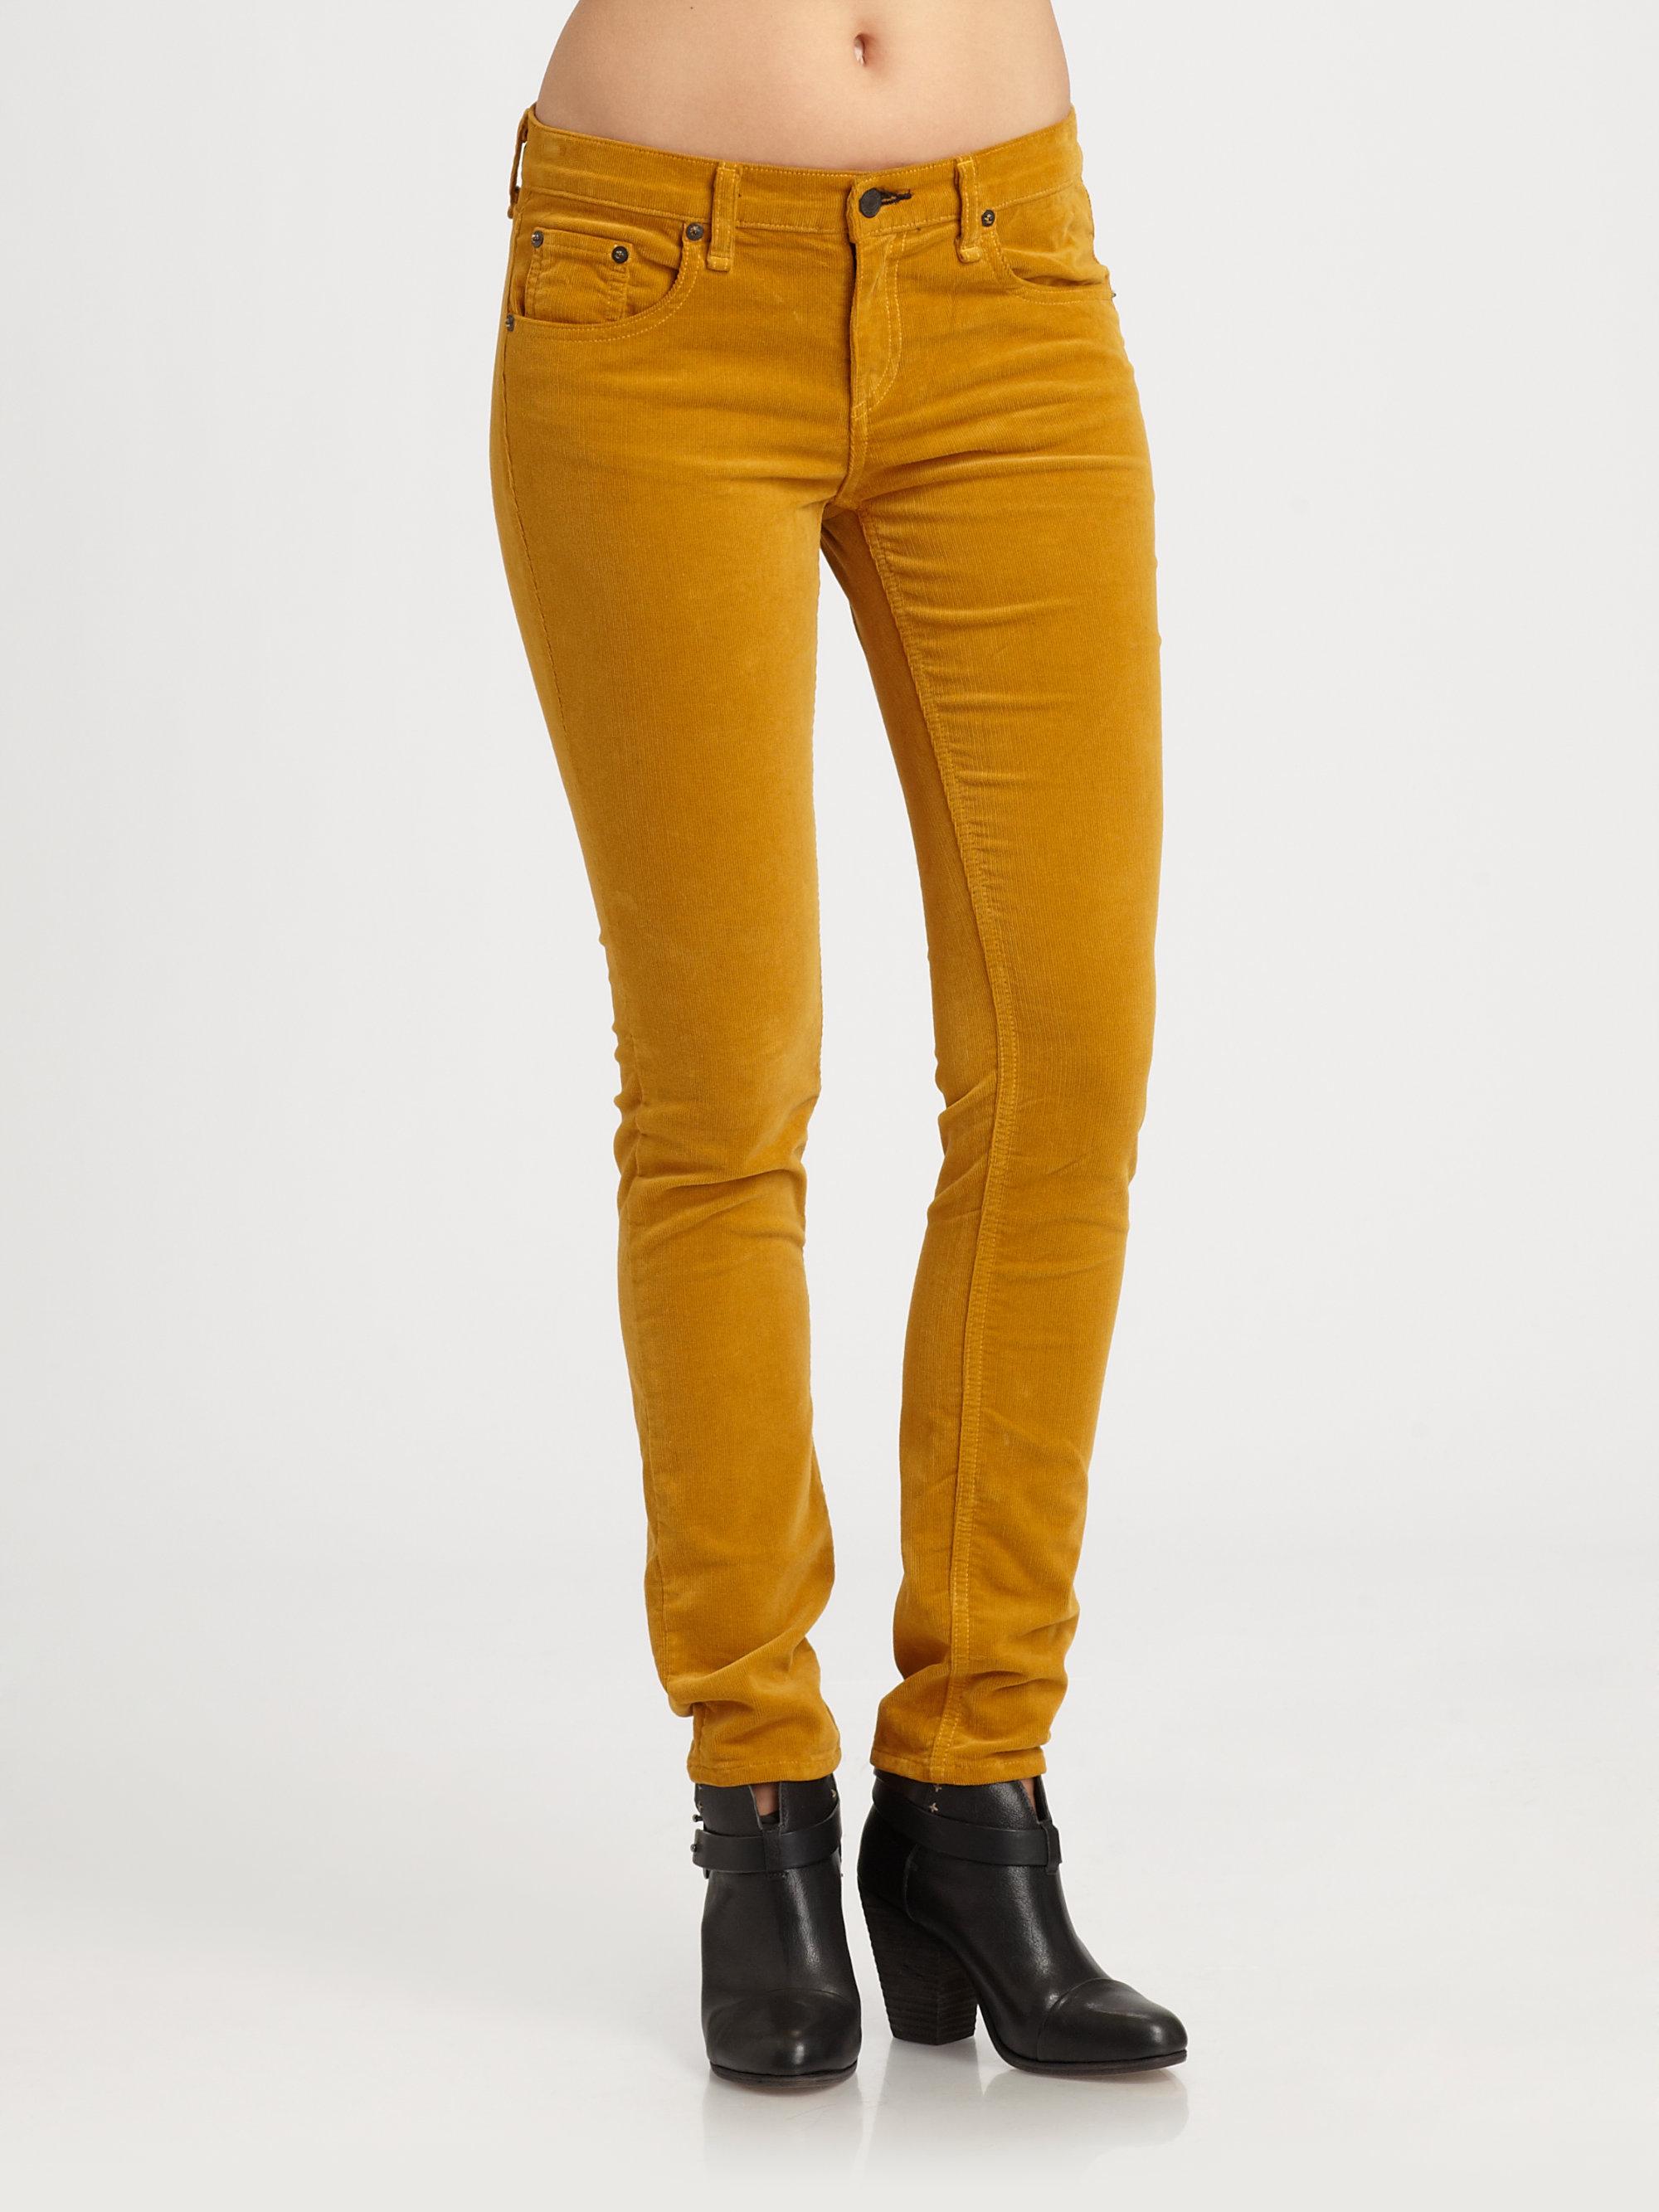 Skinny Jeans Cheap Men